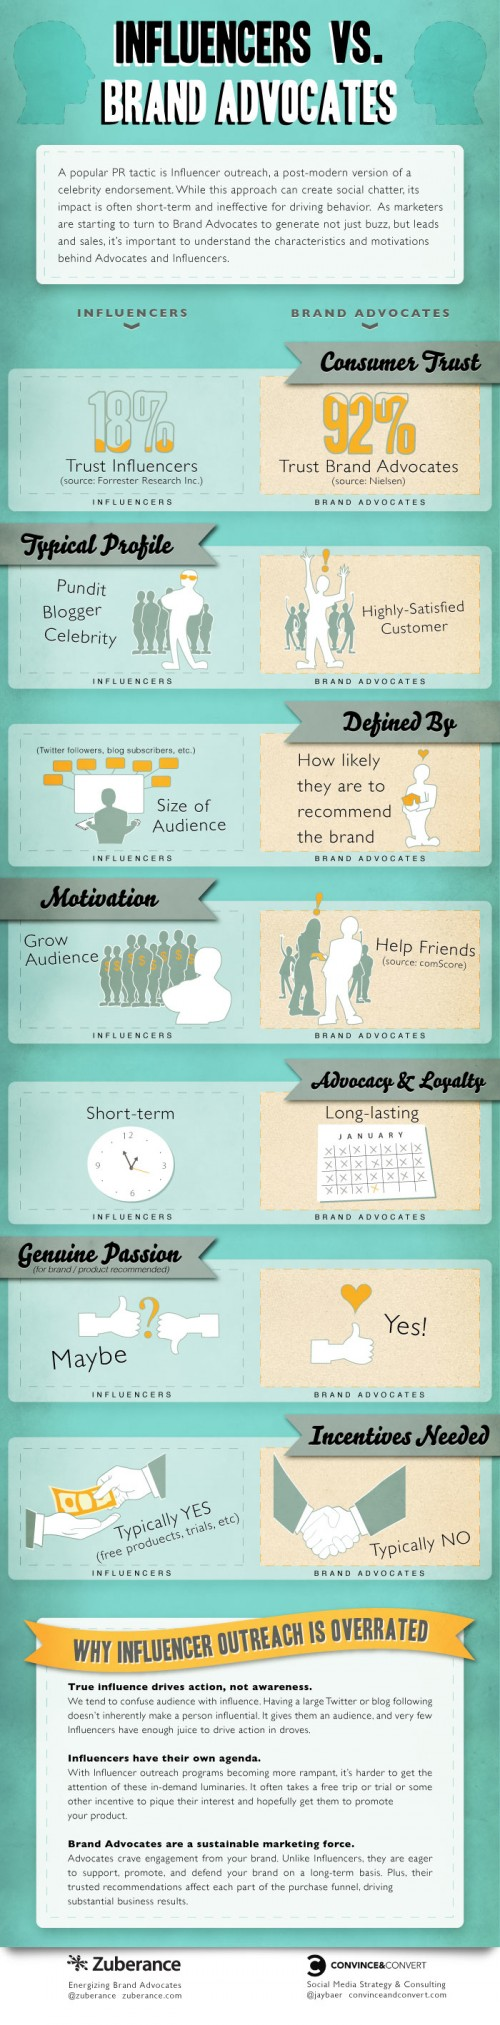 Brand Advocate vs. Influencer